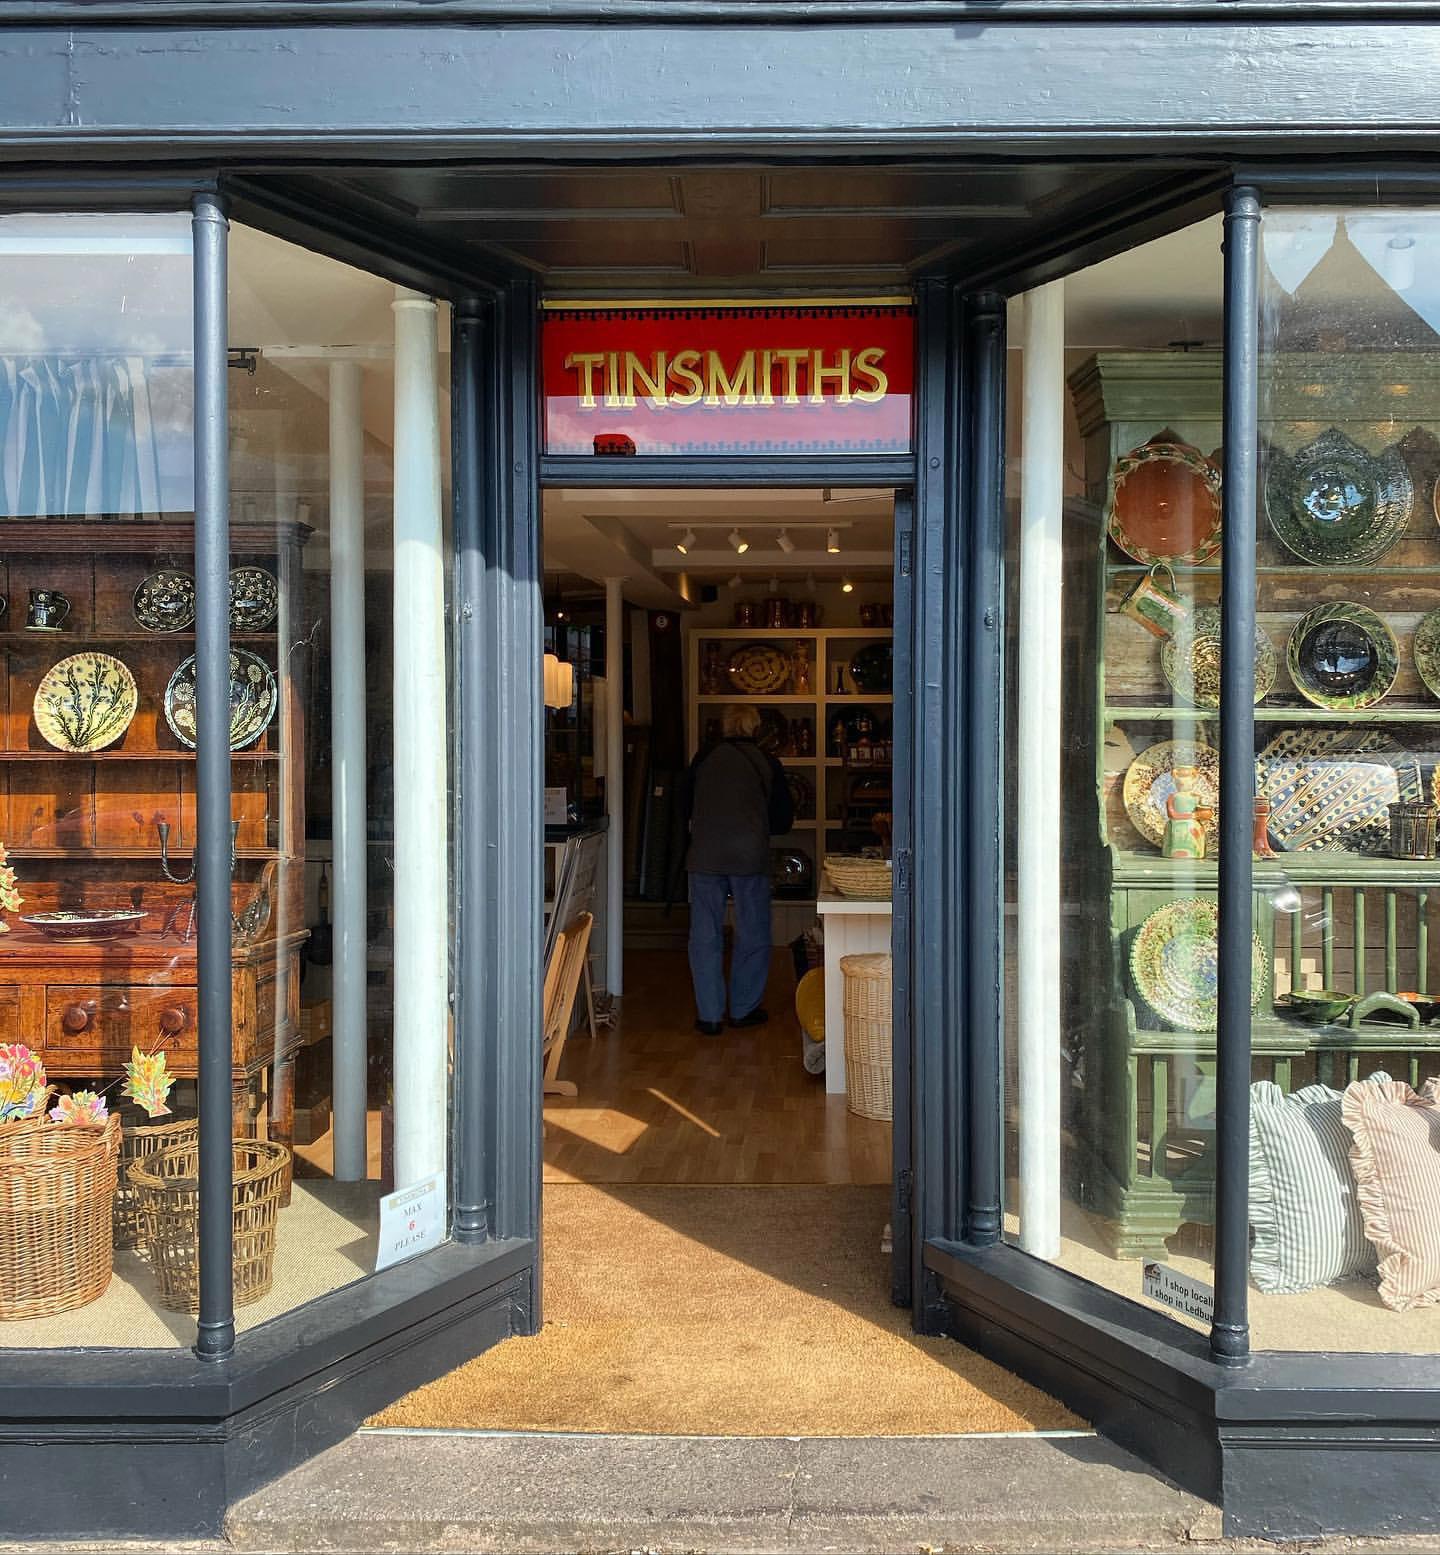 tinsmiths shop front reopening December 2020